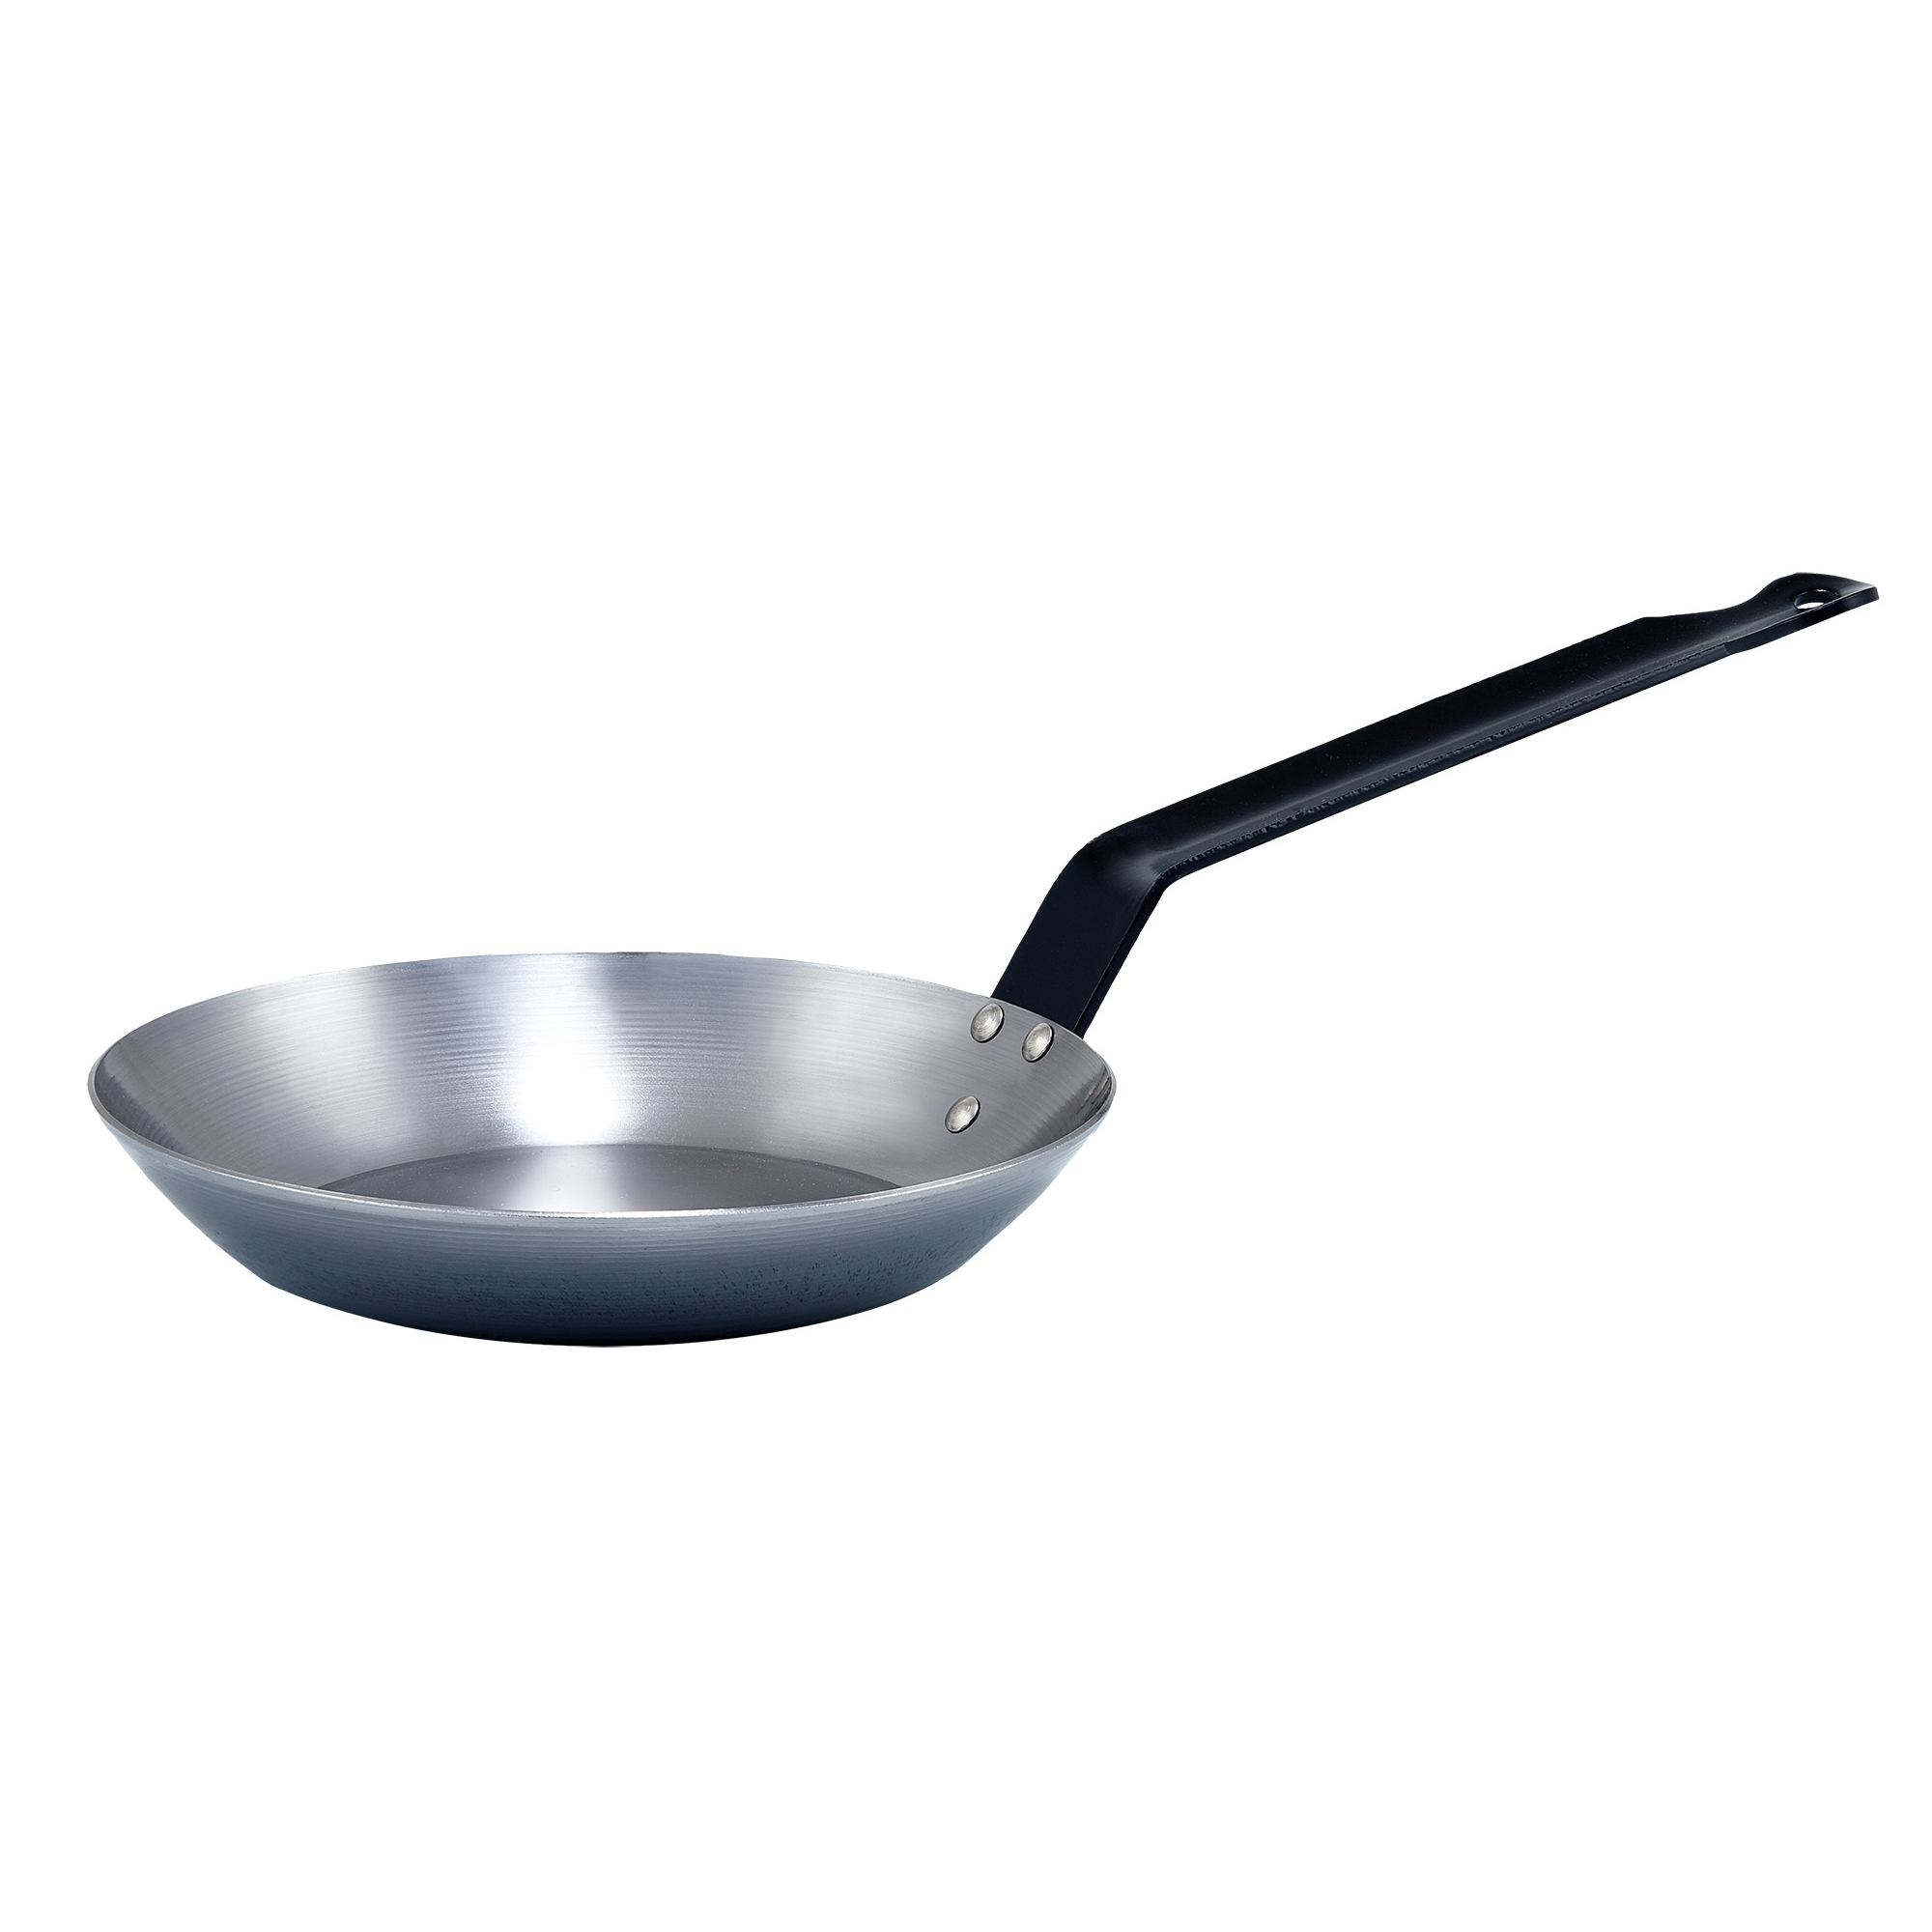 Winco CSFP-11 fry pan